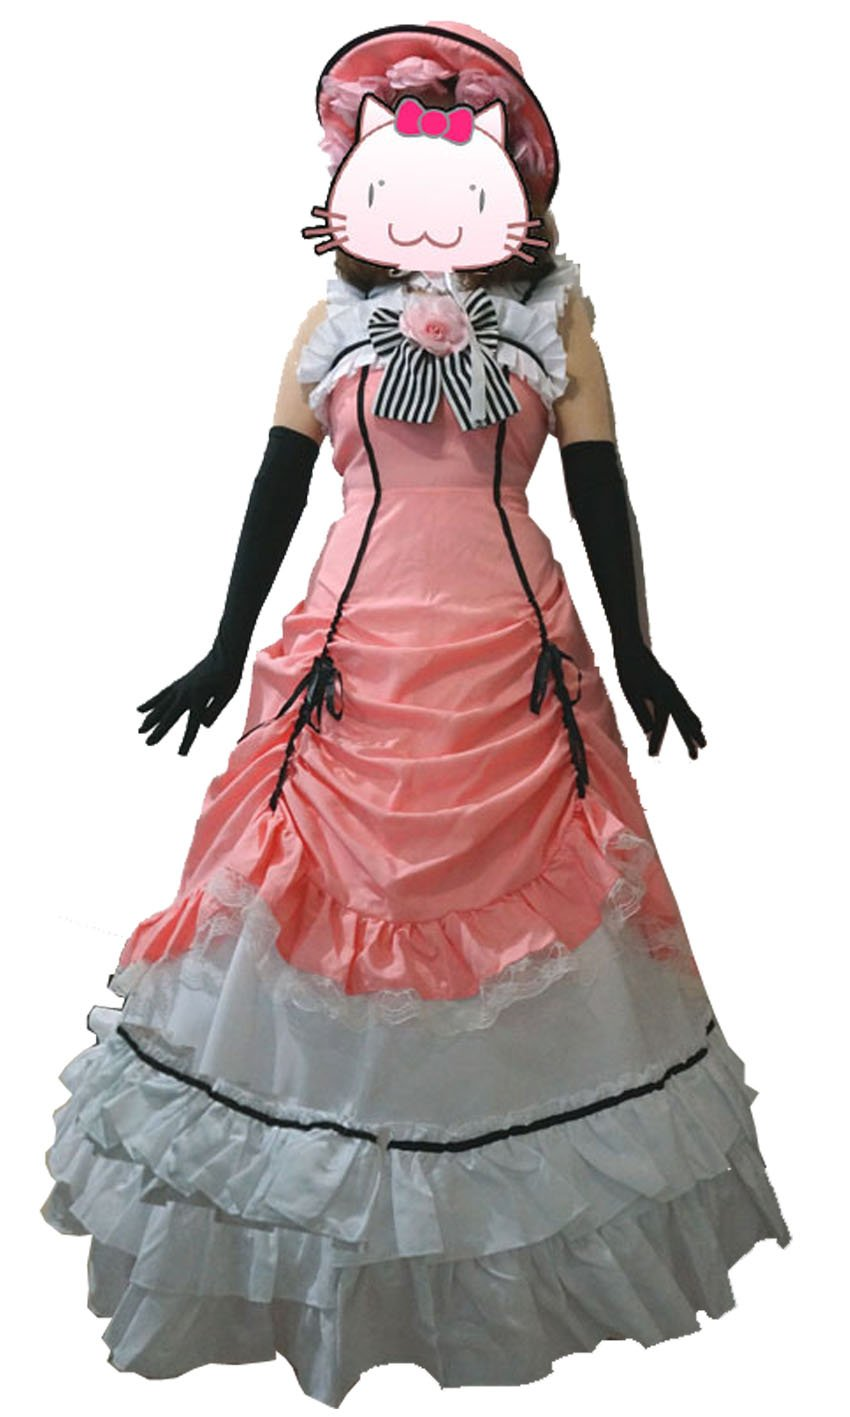 fantasycart Brand New Kuroshitsuji Black Butler CIEL Phantomhive Cosplay Costume Set Pink (S)